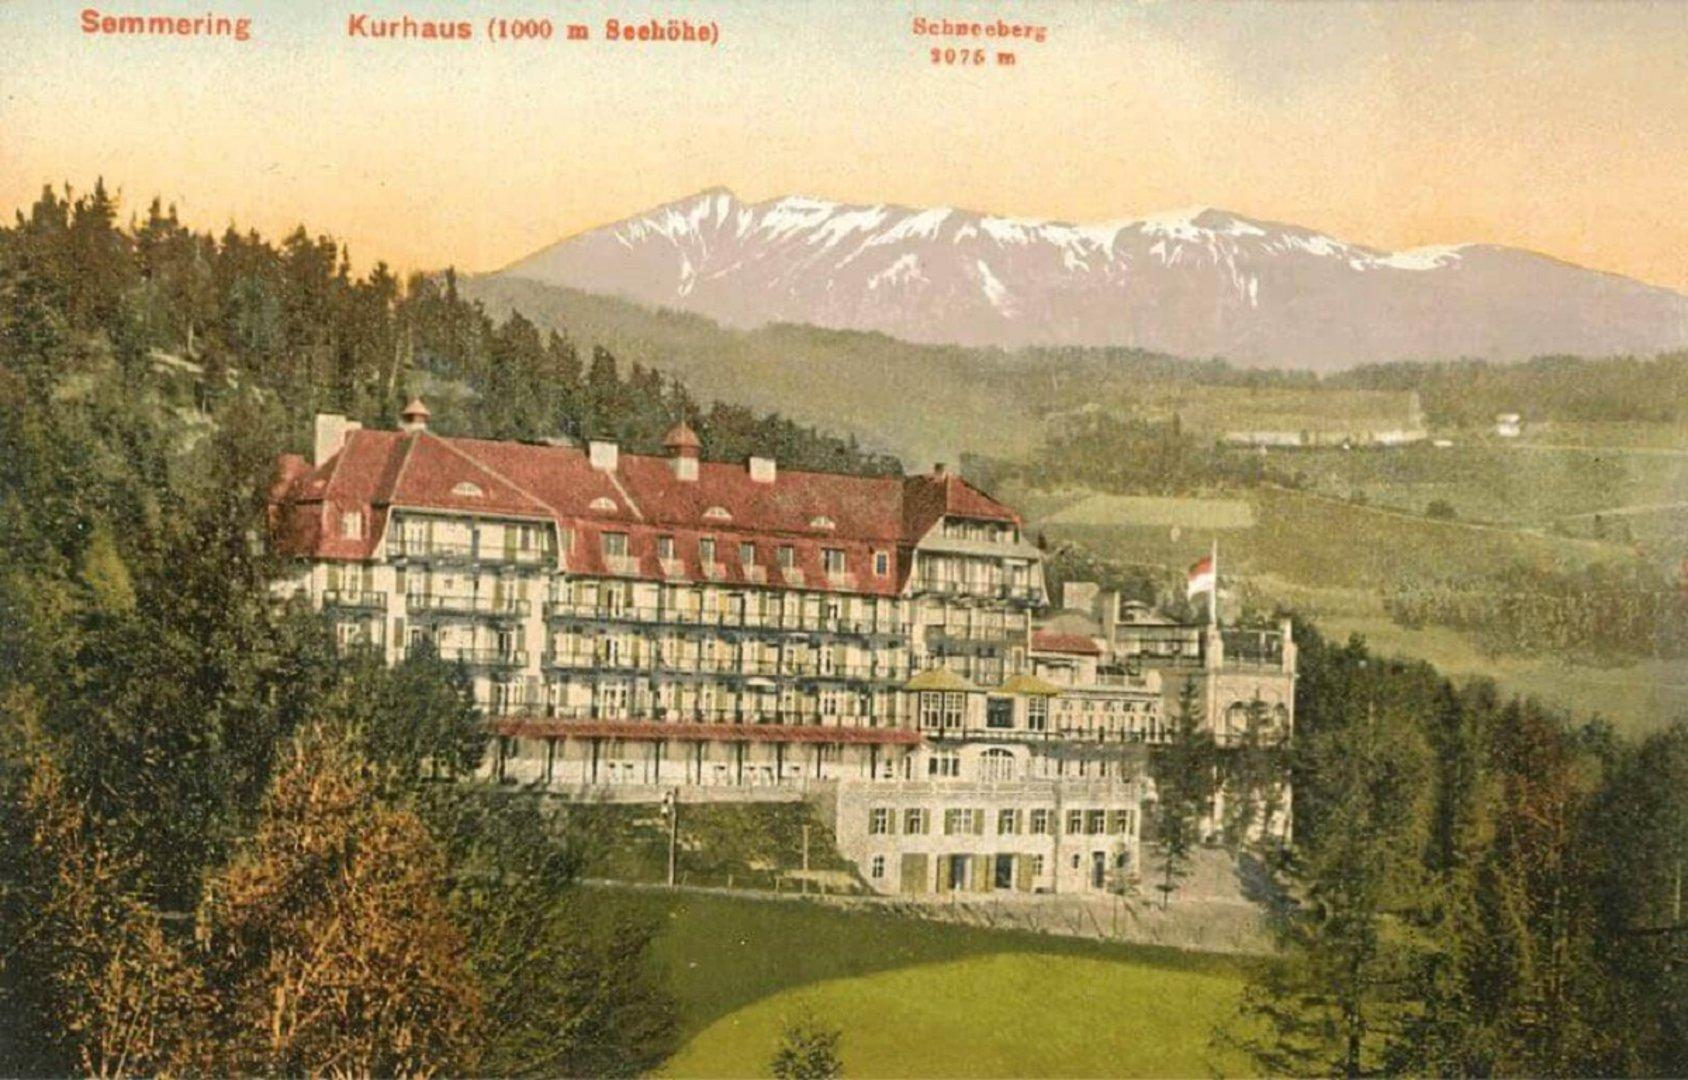 Baujuwelen, Bausünden: Kurhaus Semmering erhält Strahlkraft